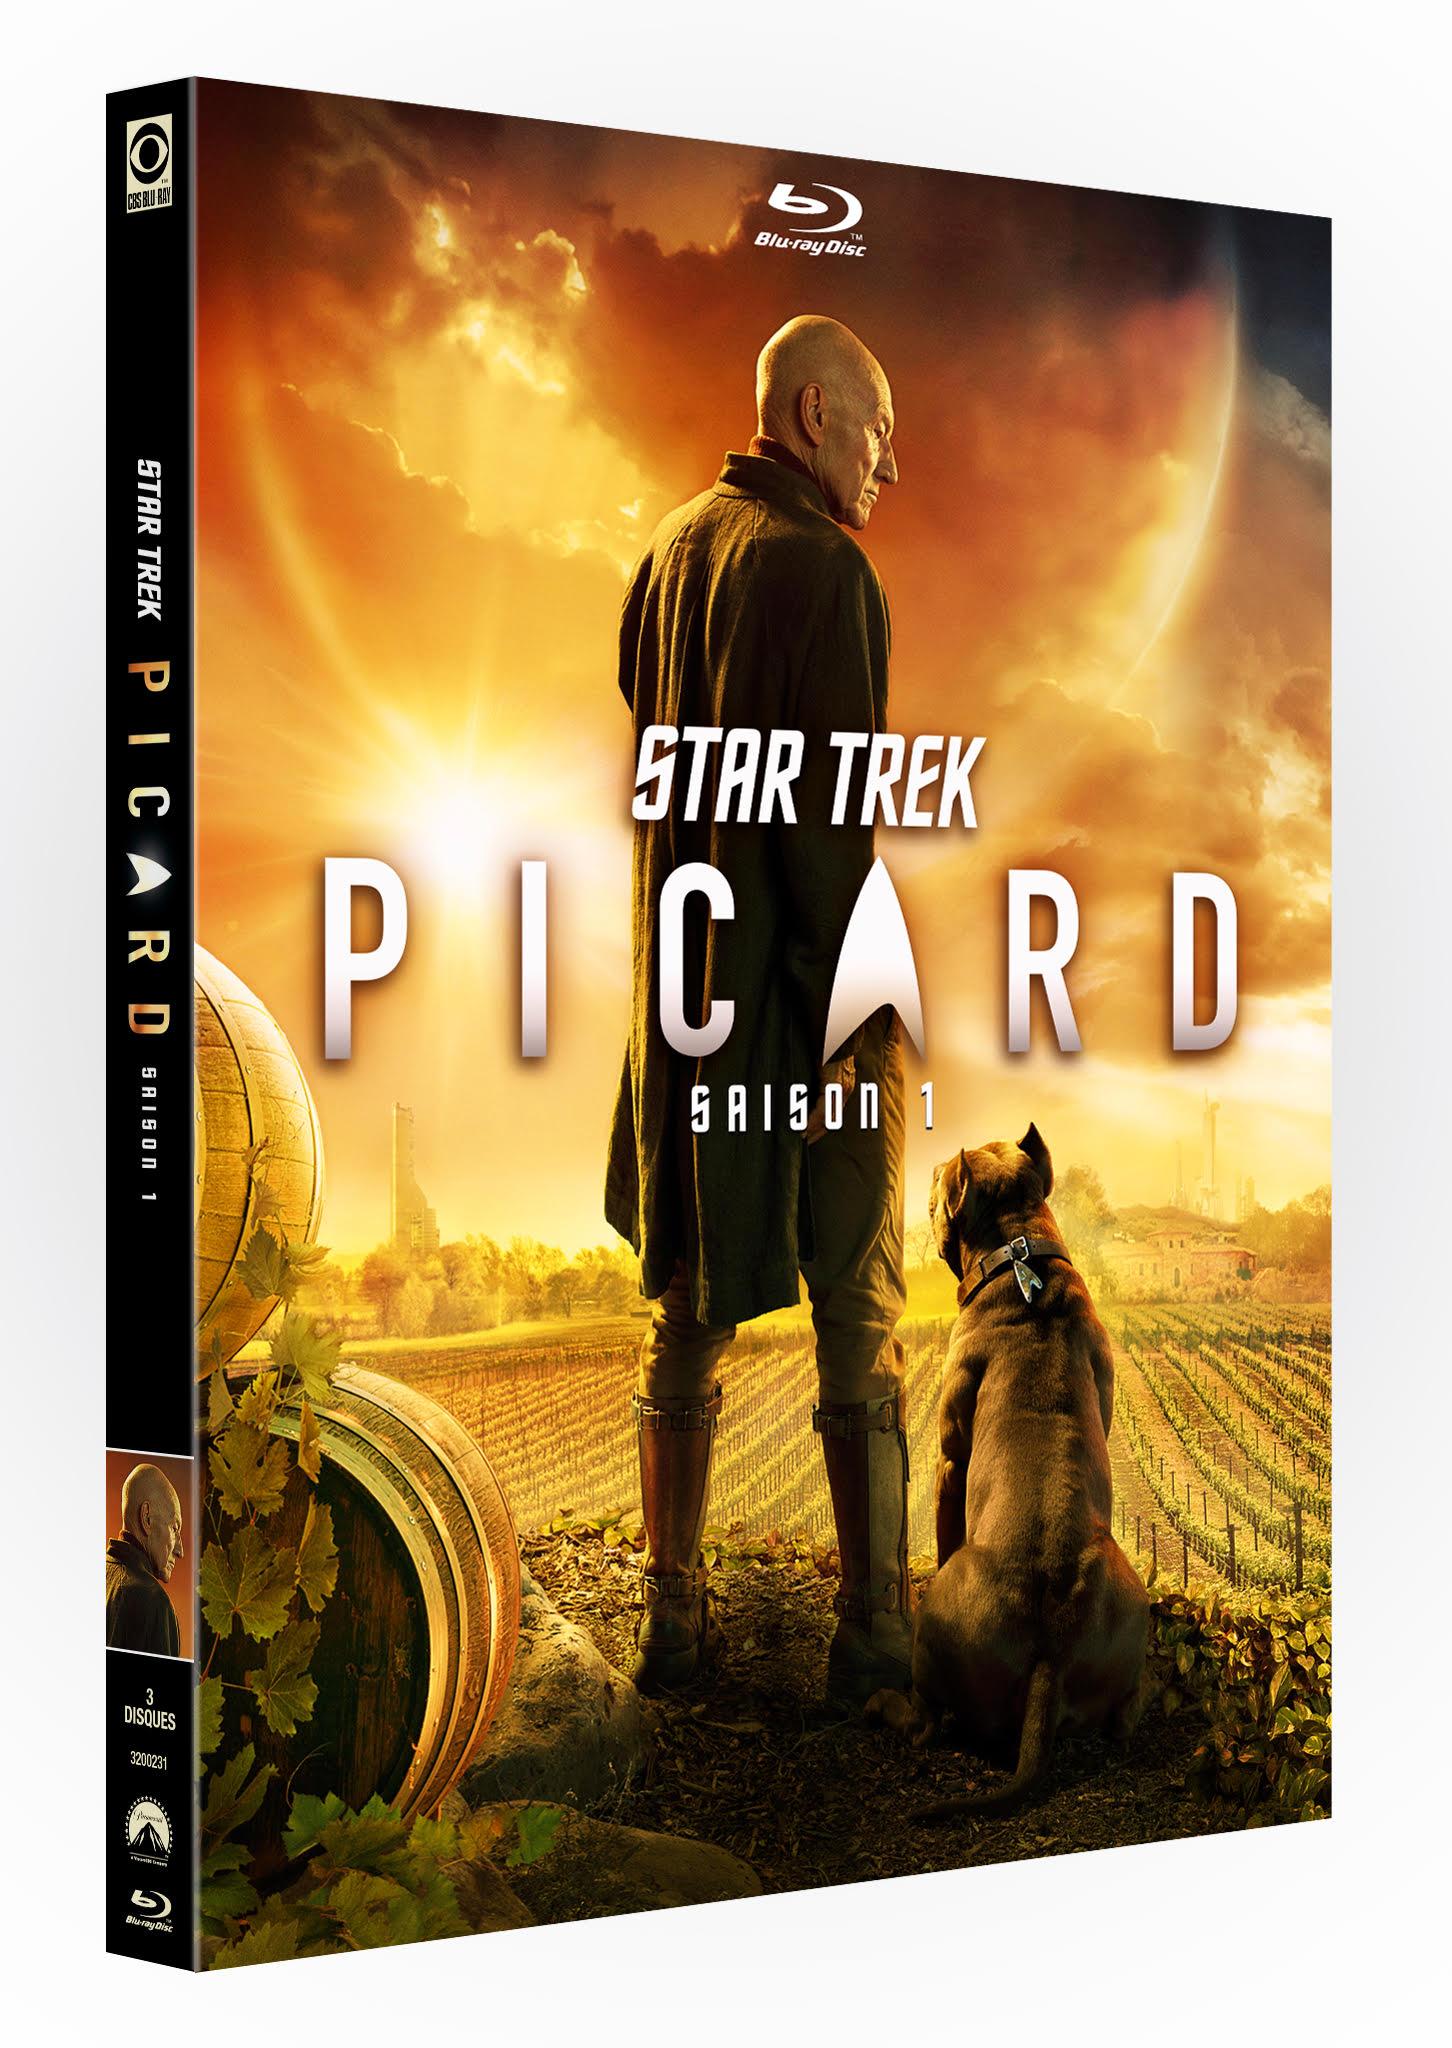 STAR TREK PICARD - 3 BRD